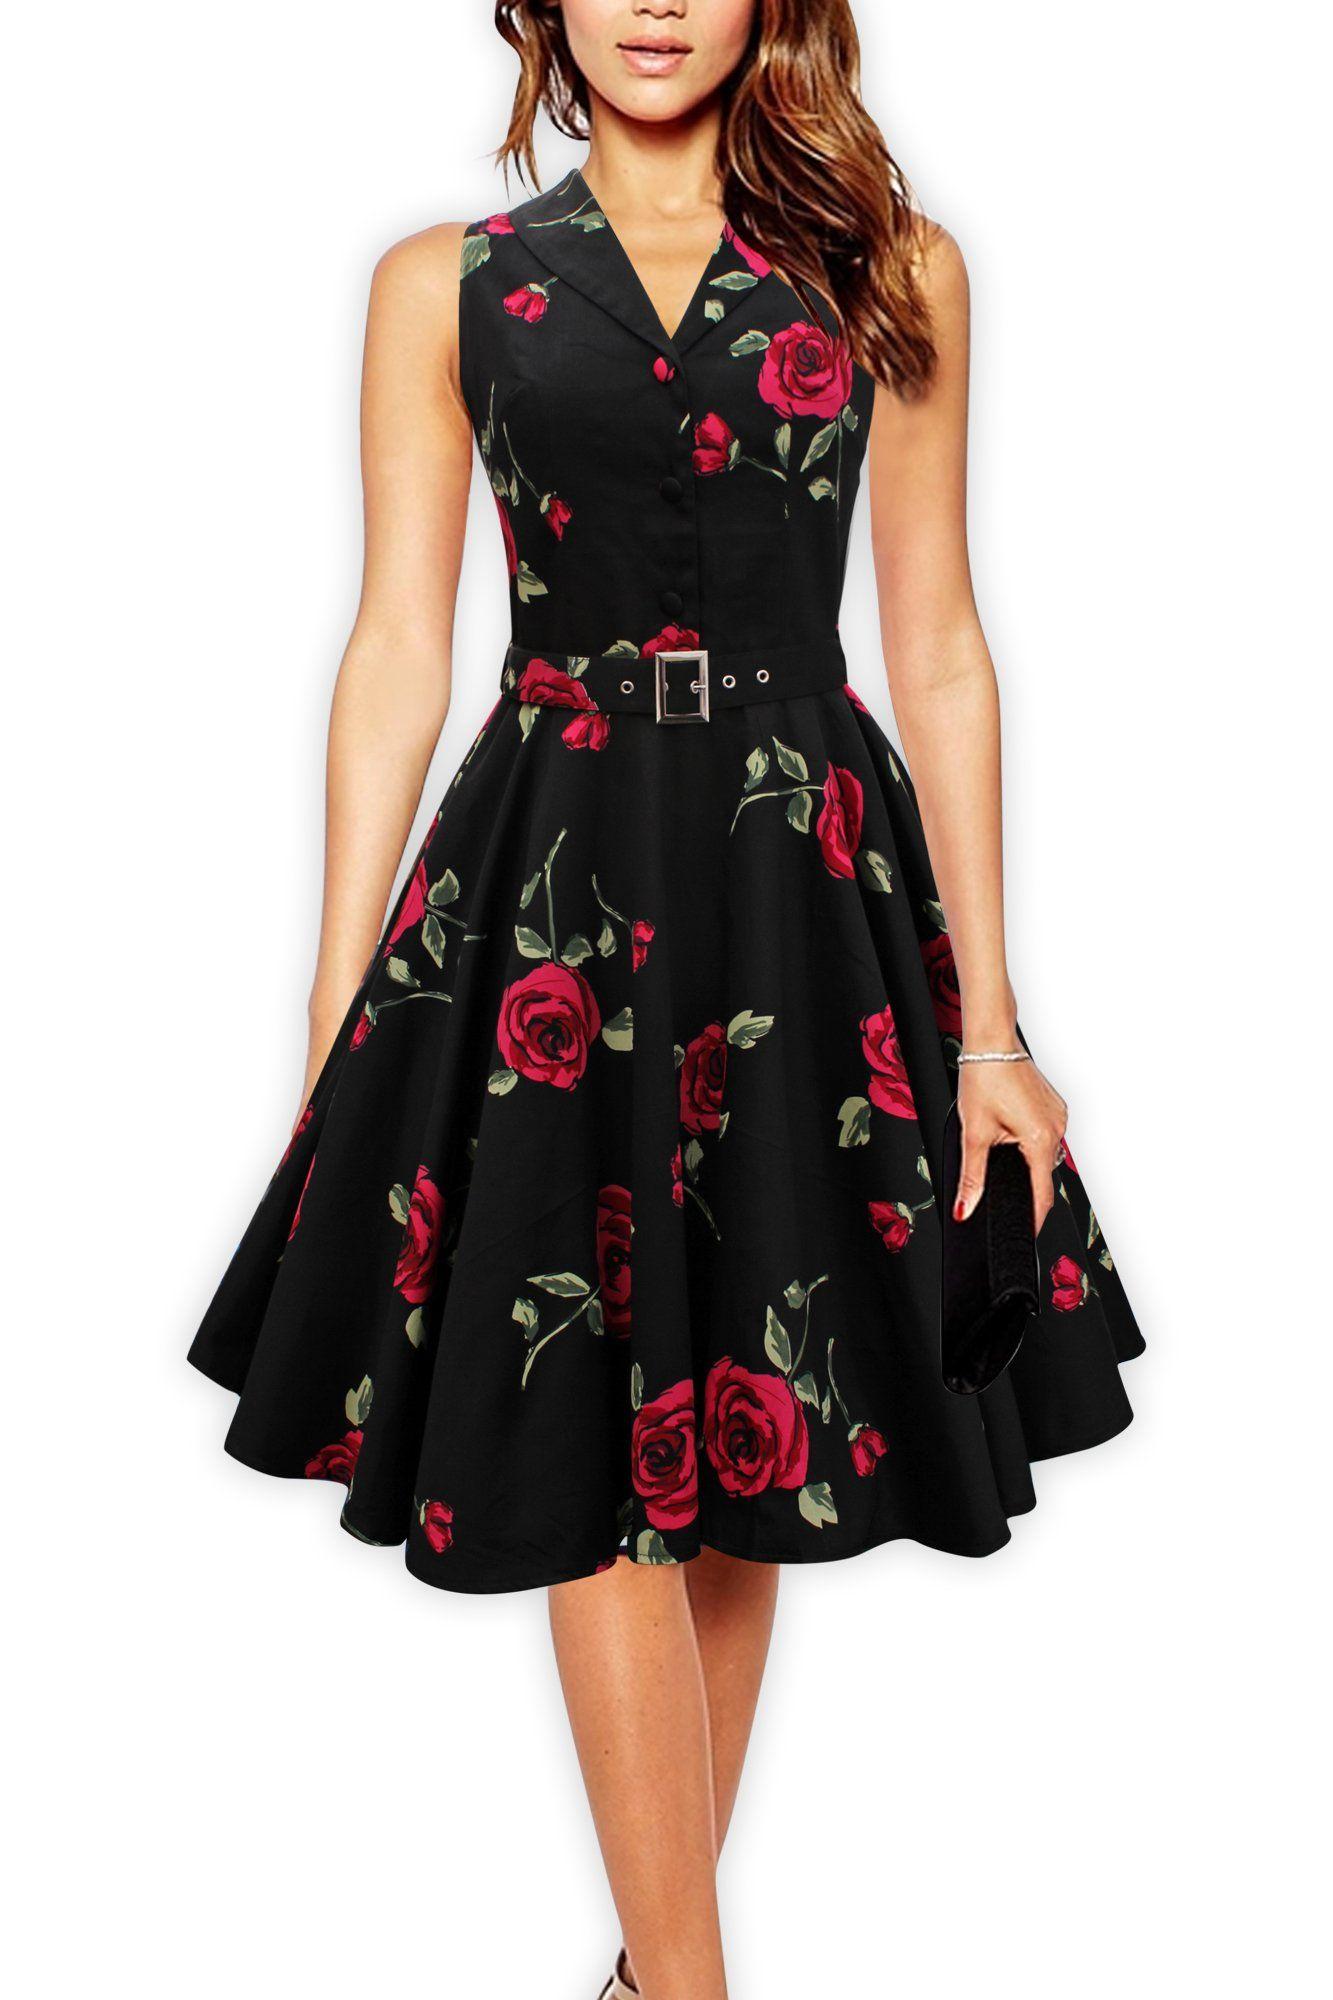 57ea3338ed8 Black Butterfly Vintage 1950 s Rockabilly Swing Dress (Black - Large Roses